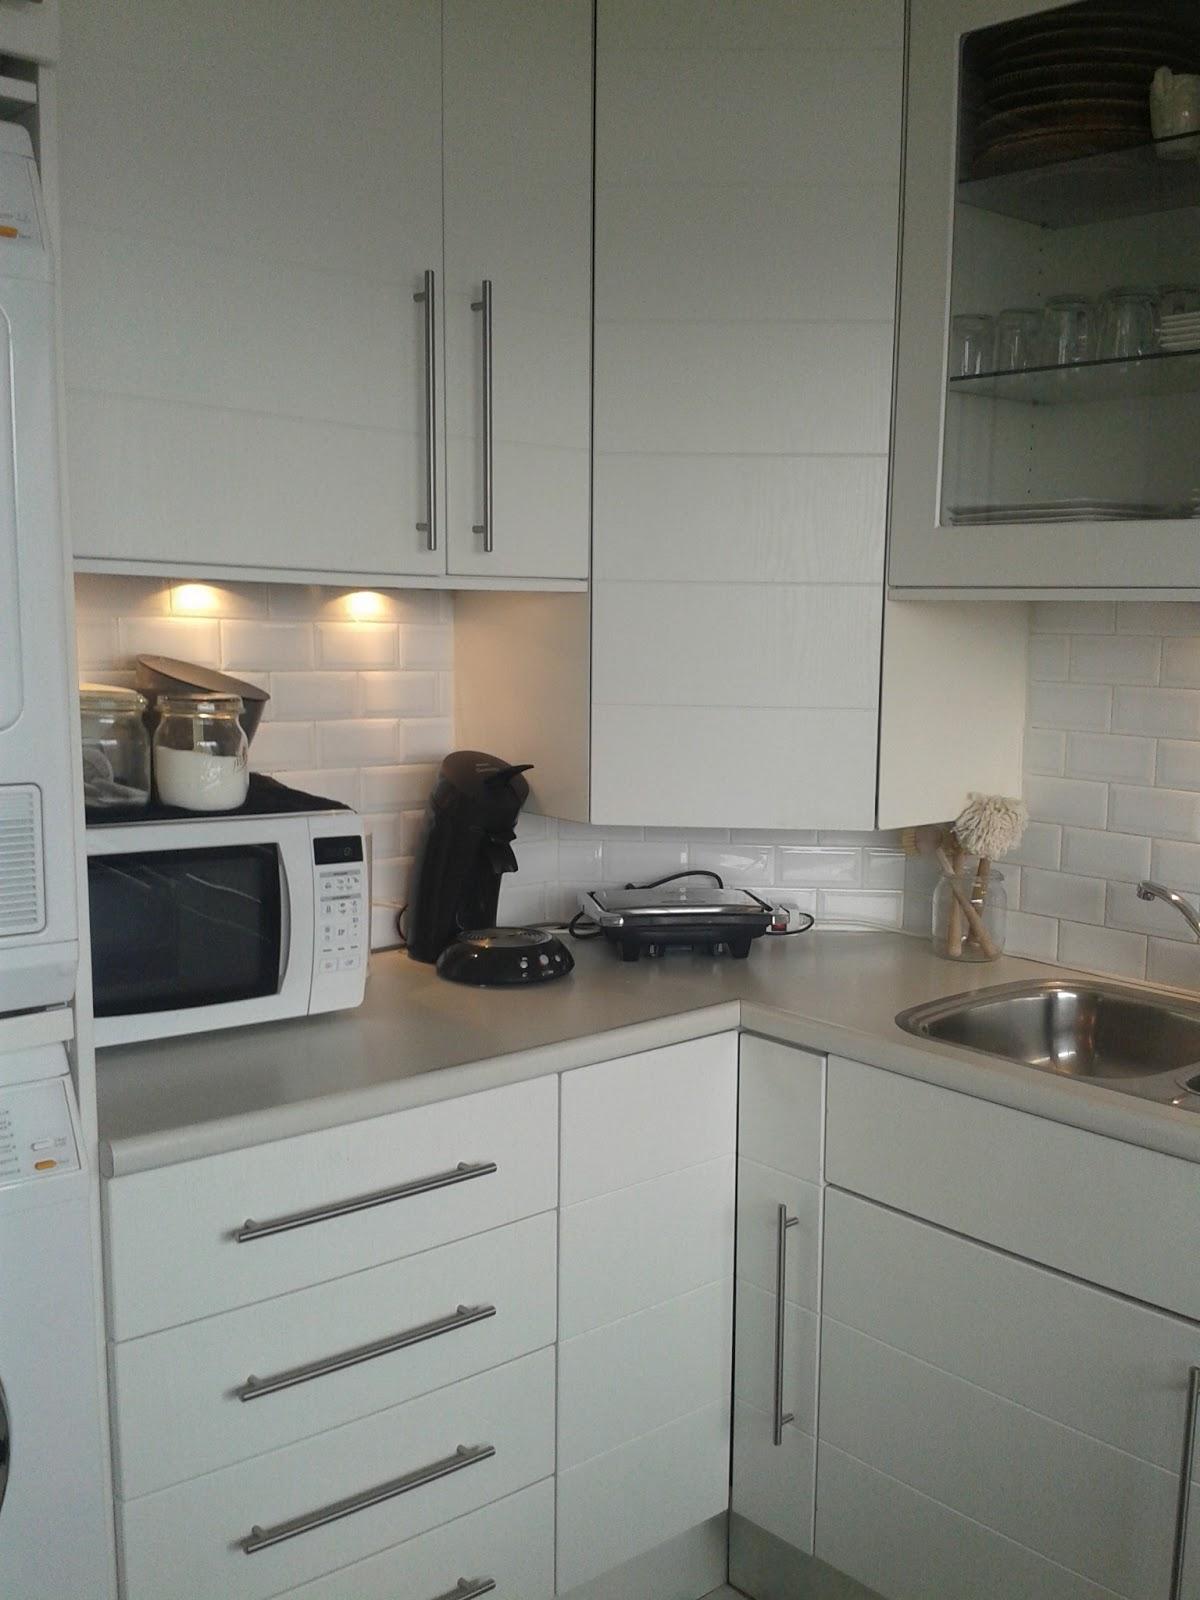 Notti's life: de keuken